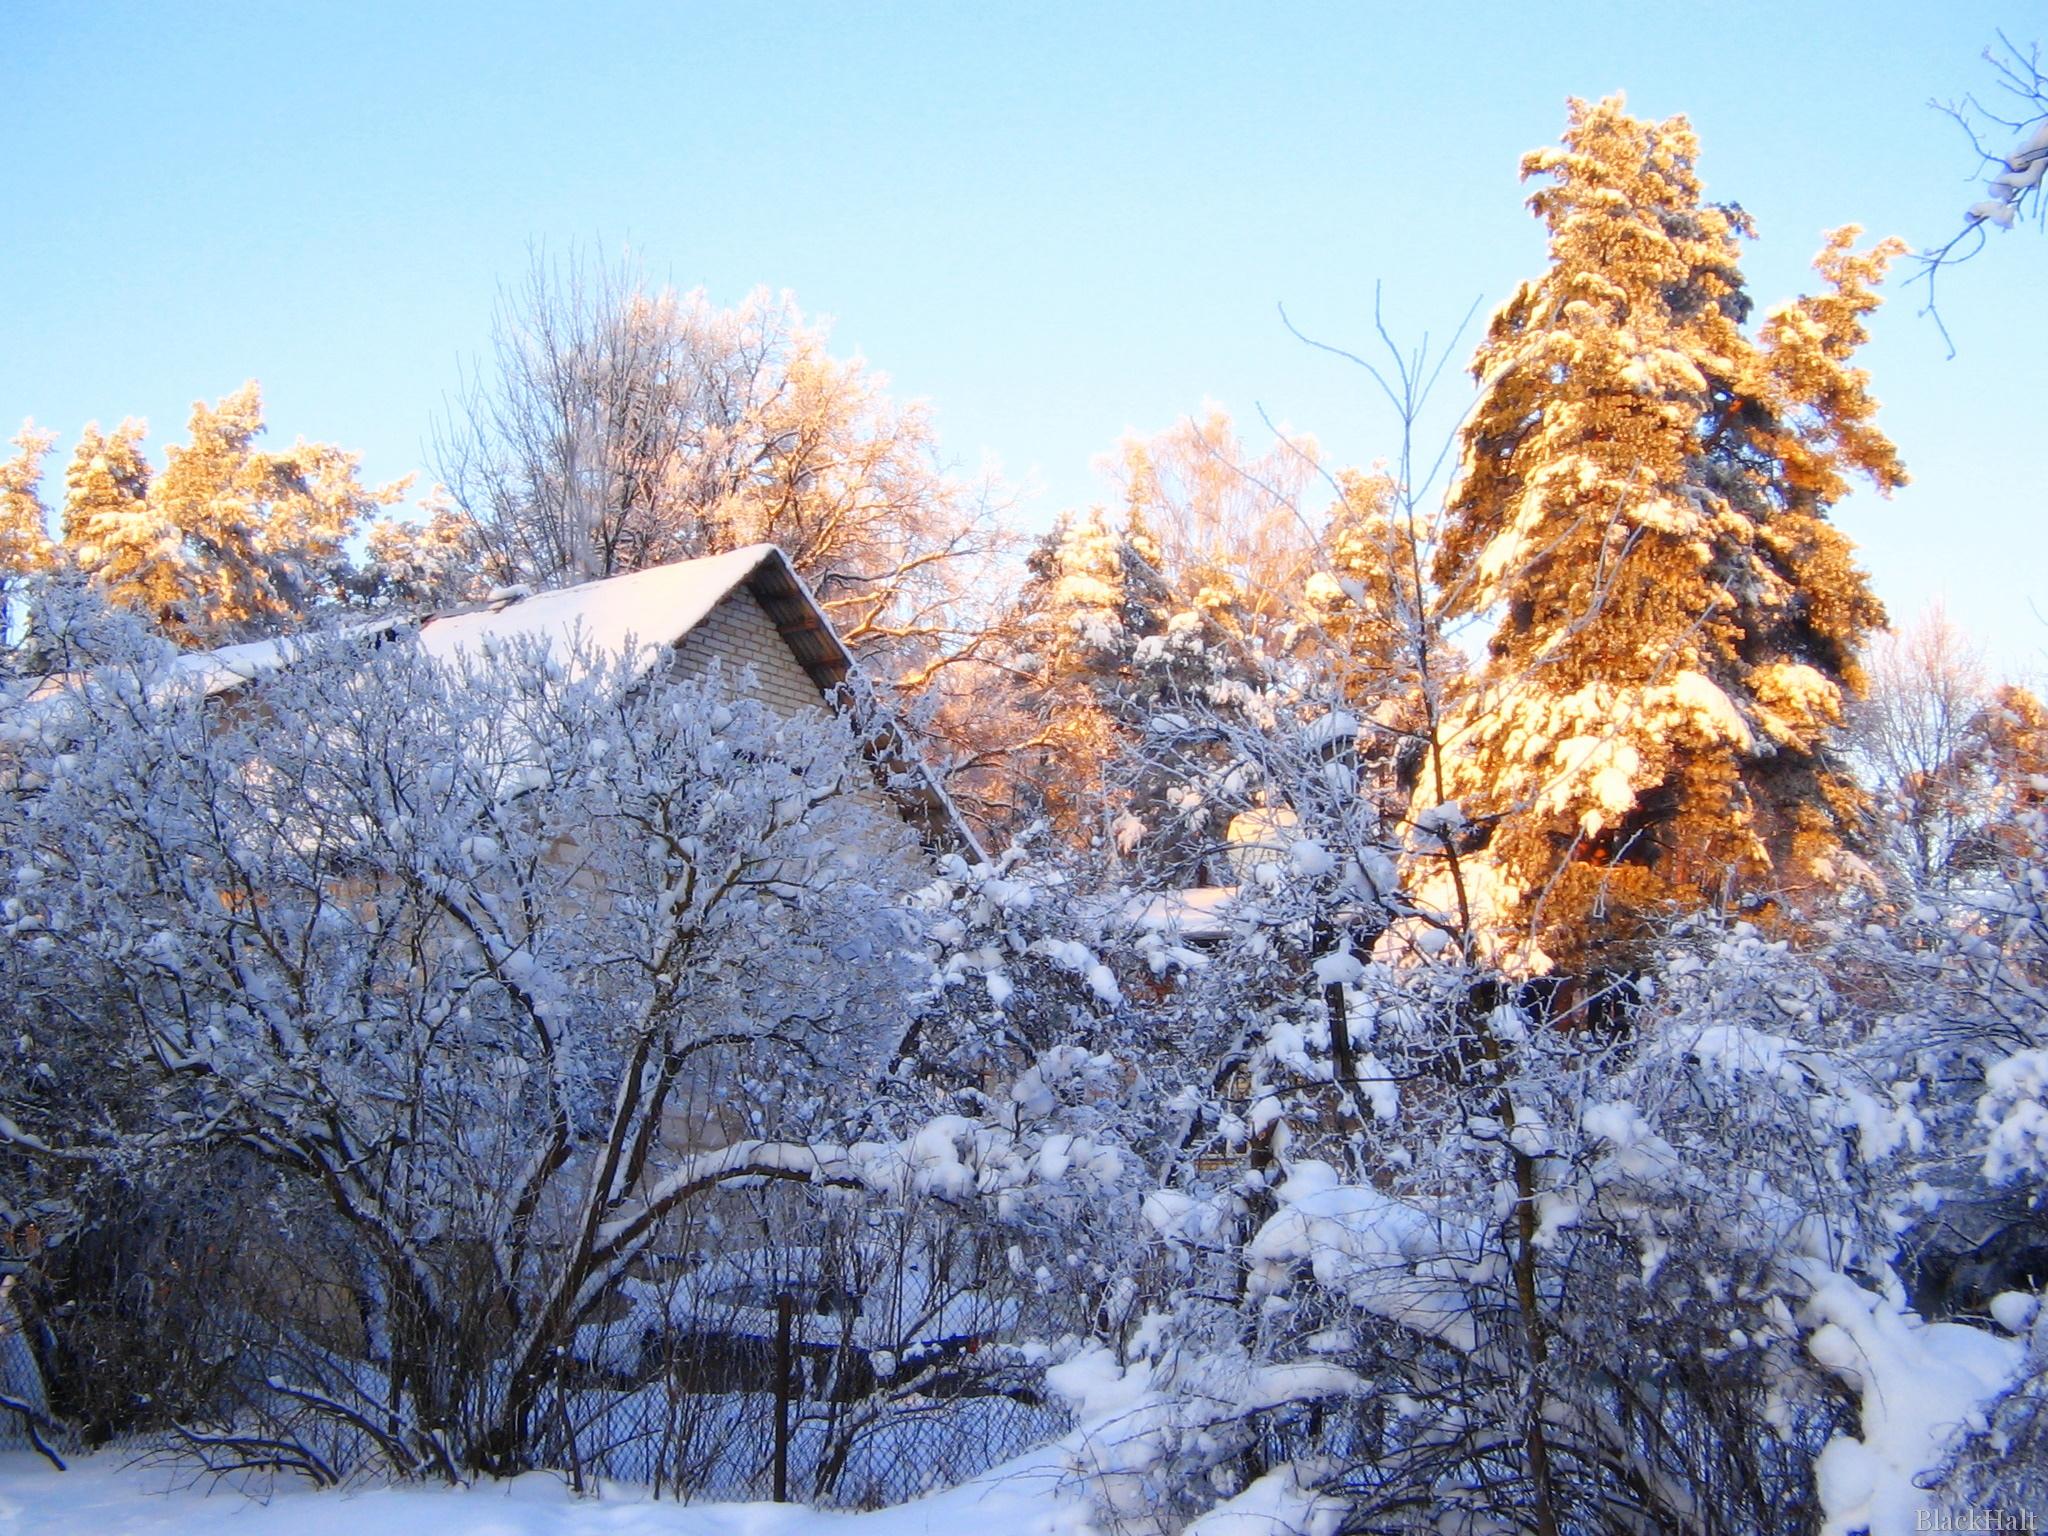 Sniegots skats